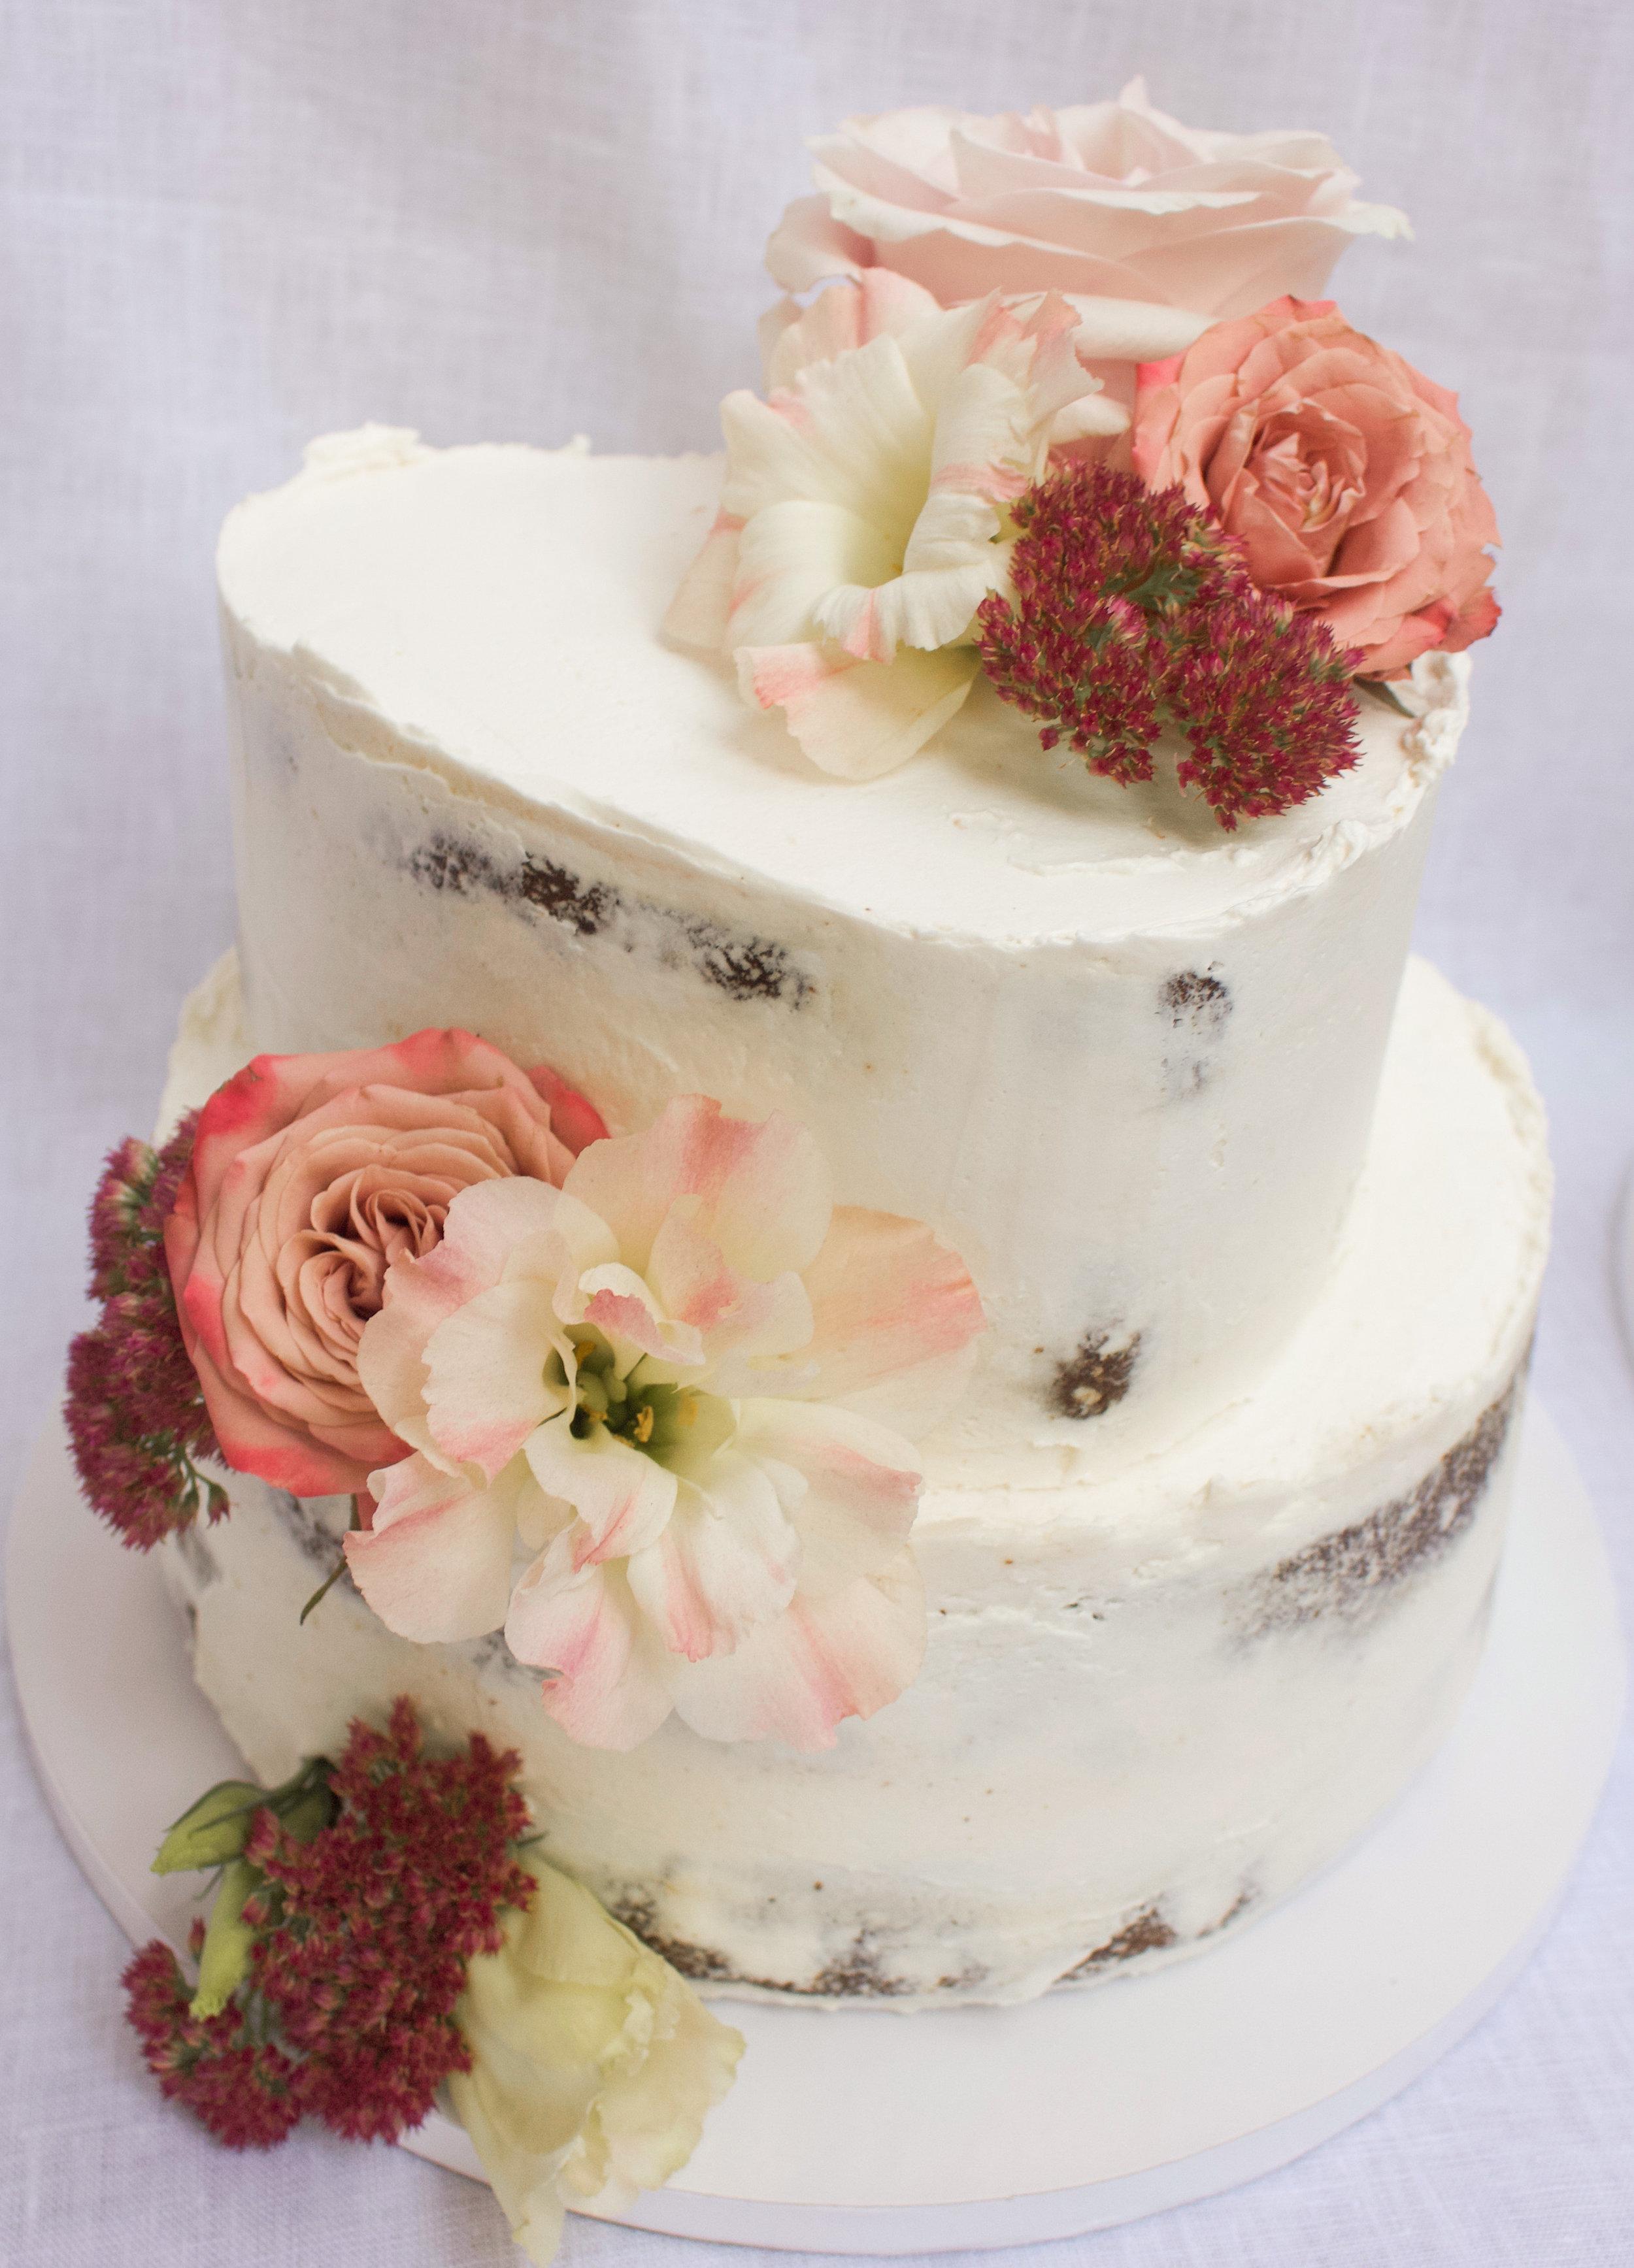 < vegan gingerbread & pear w/ salted caramel wedding cake >